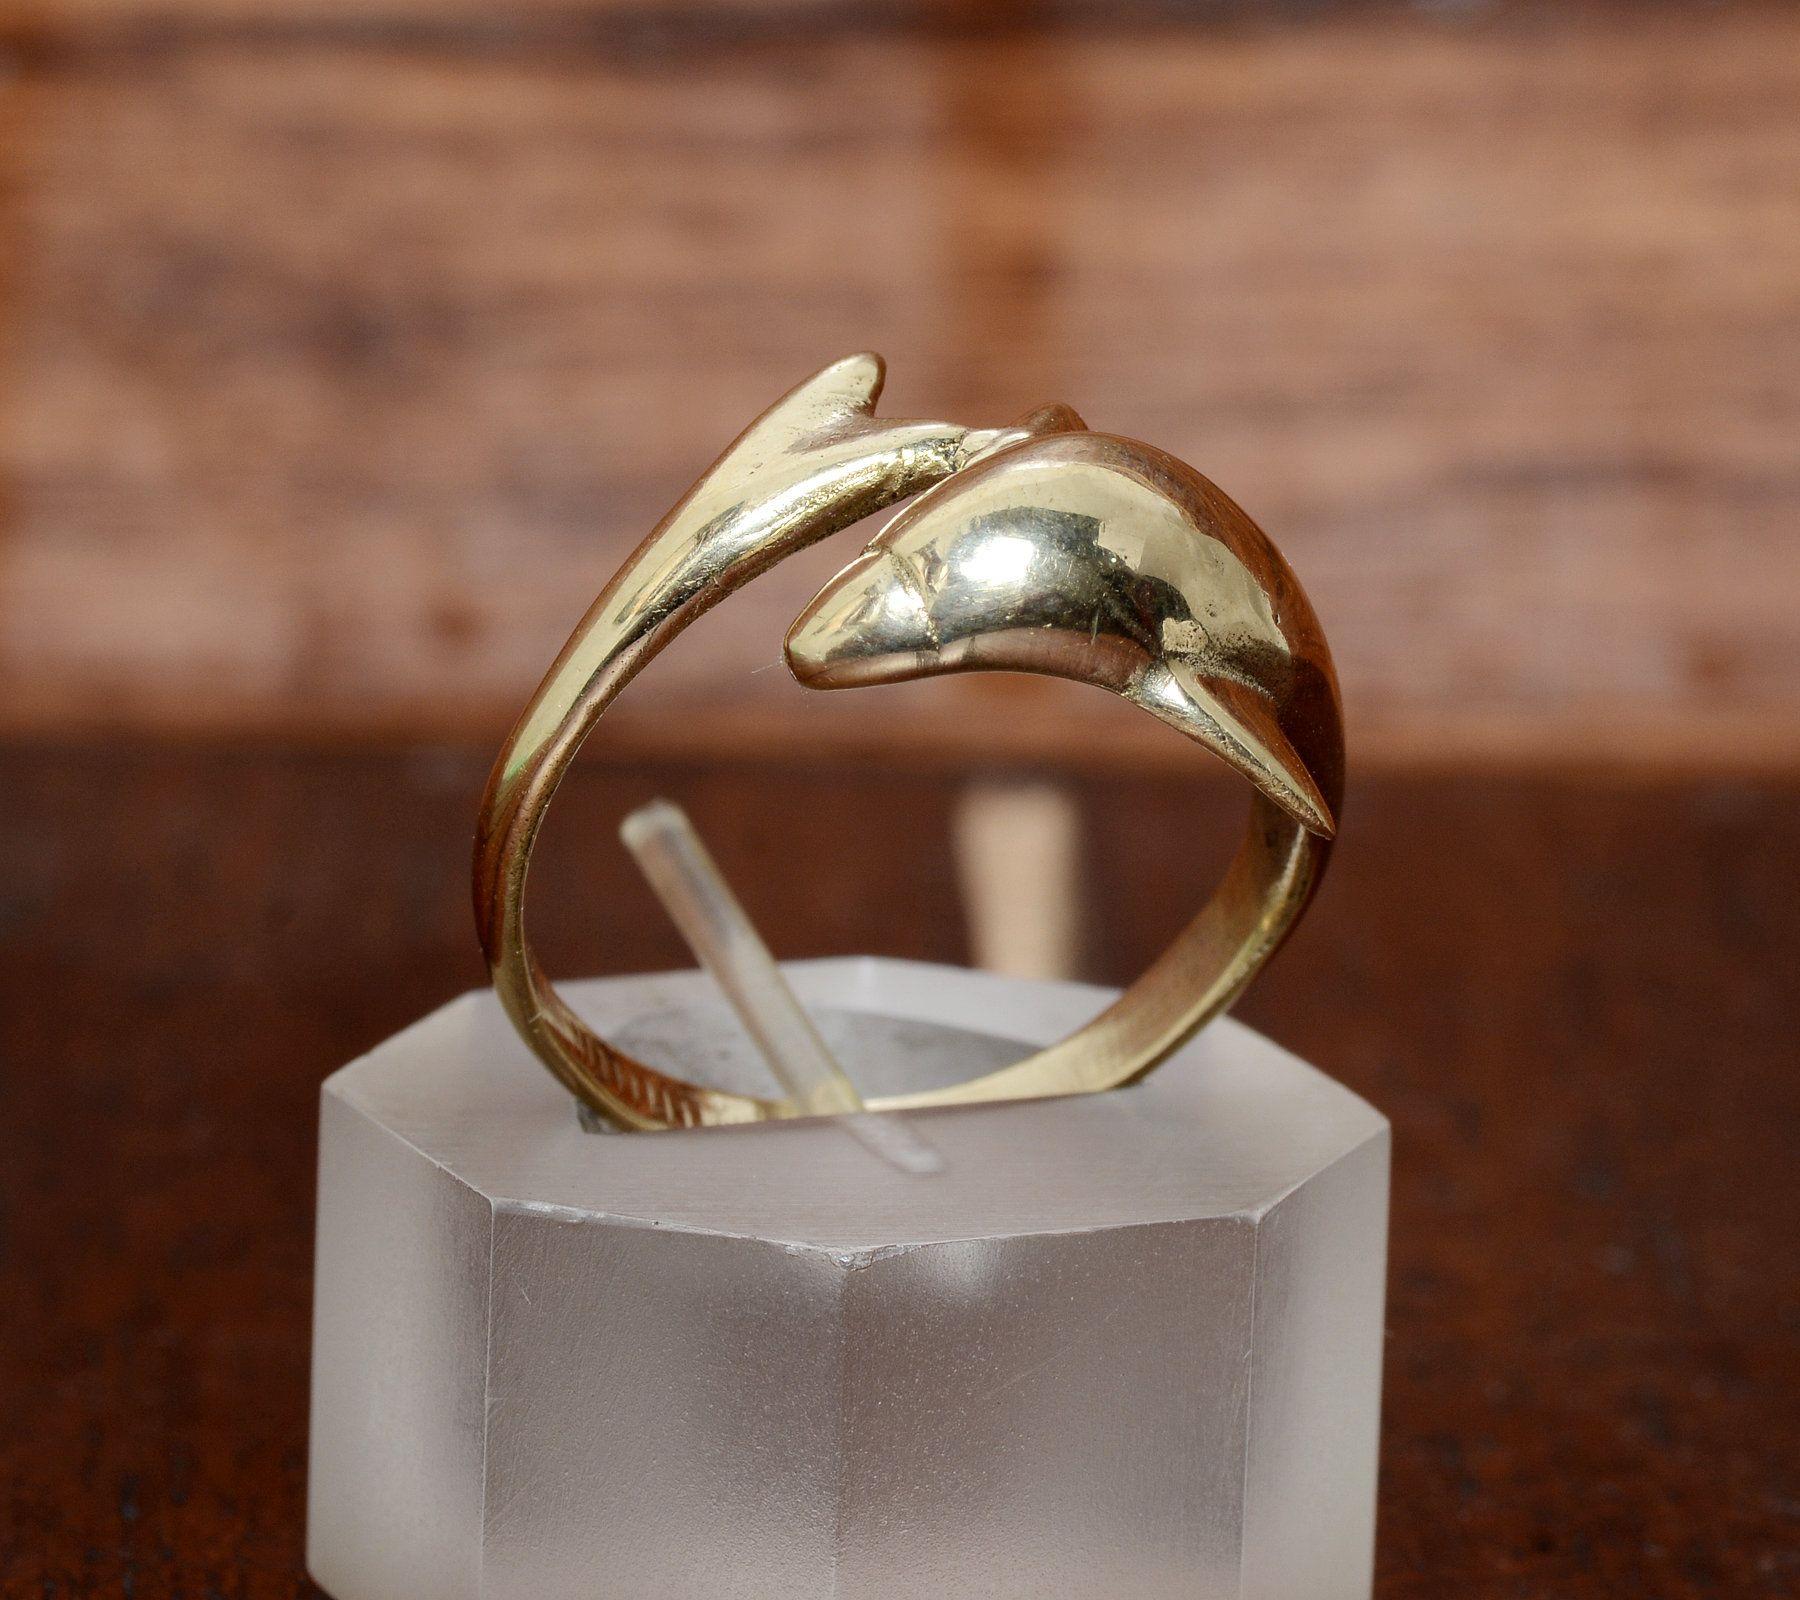 Brass Band #Boho Band #Handmade Band #Wedding Band #Vintage Band #Unique Band #Gift Band #Valentine Band  #Gift For Her Valentine Gift